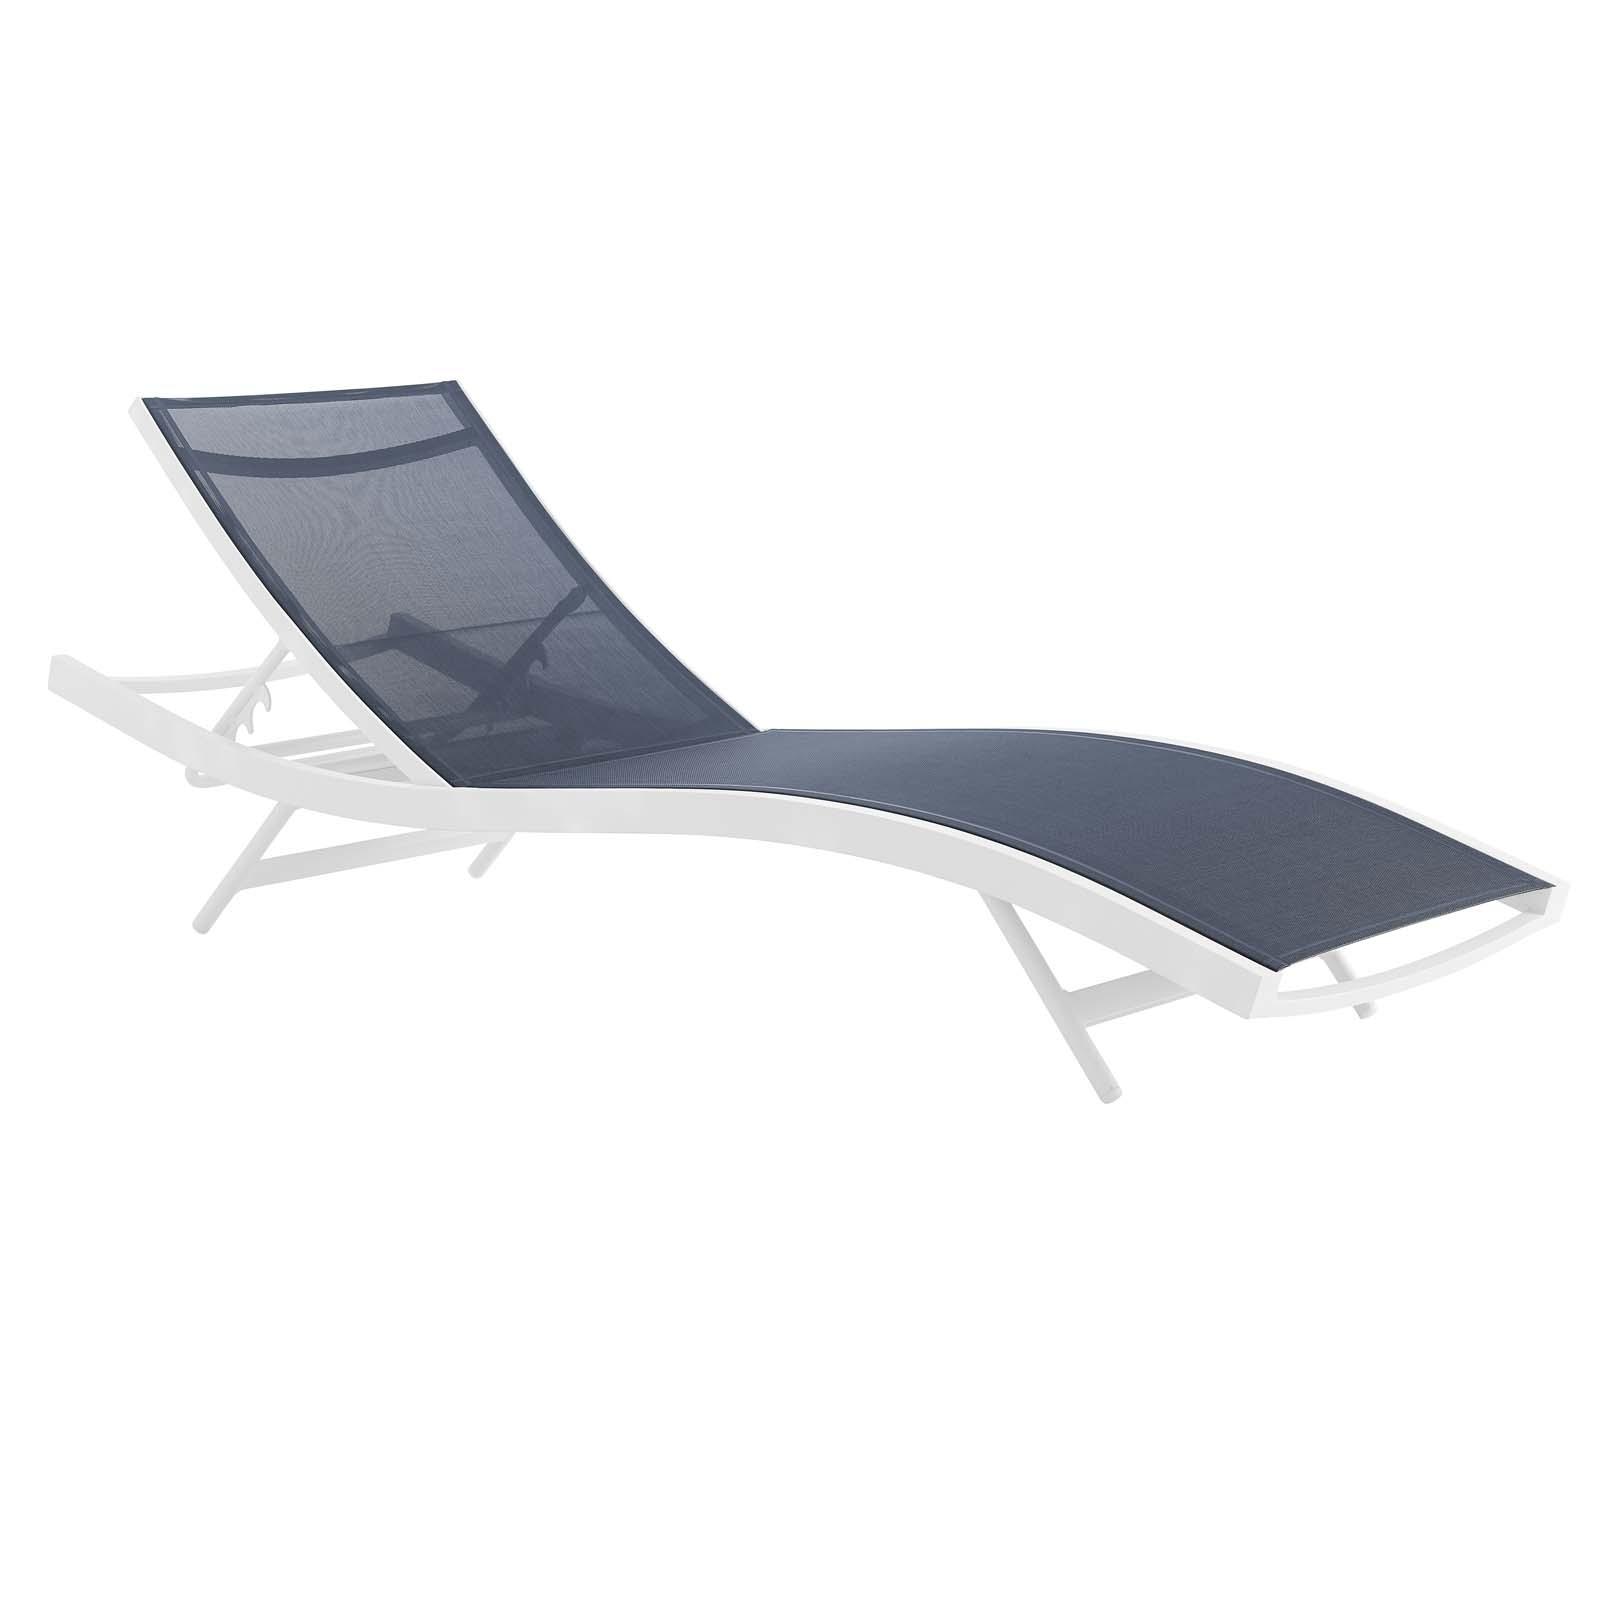 Brilliant Glimpse Outdoor Patio Mesh Chaise Lounge Chair Machost Co Dining Chair Design Ideas Machostcouk